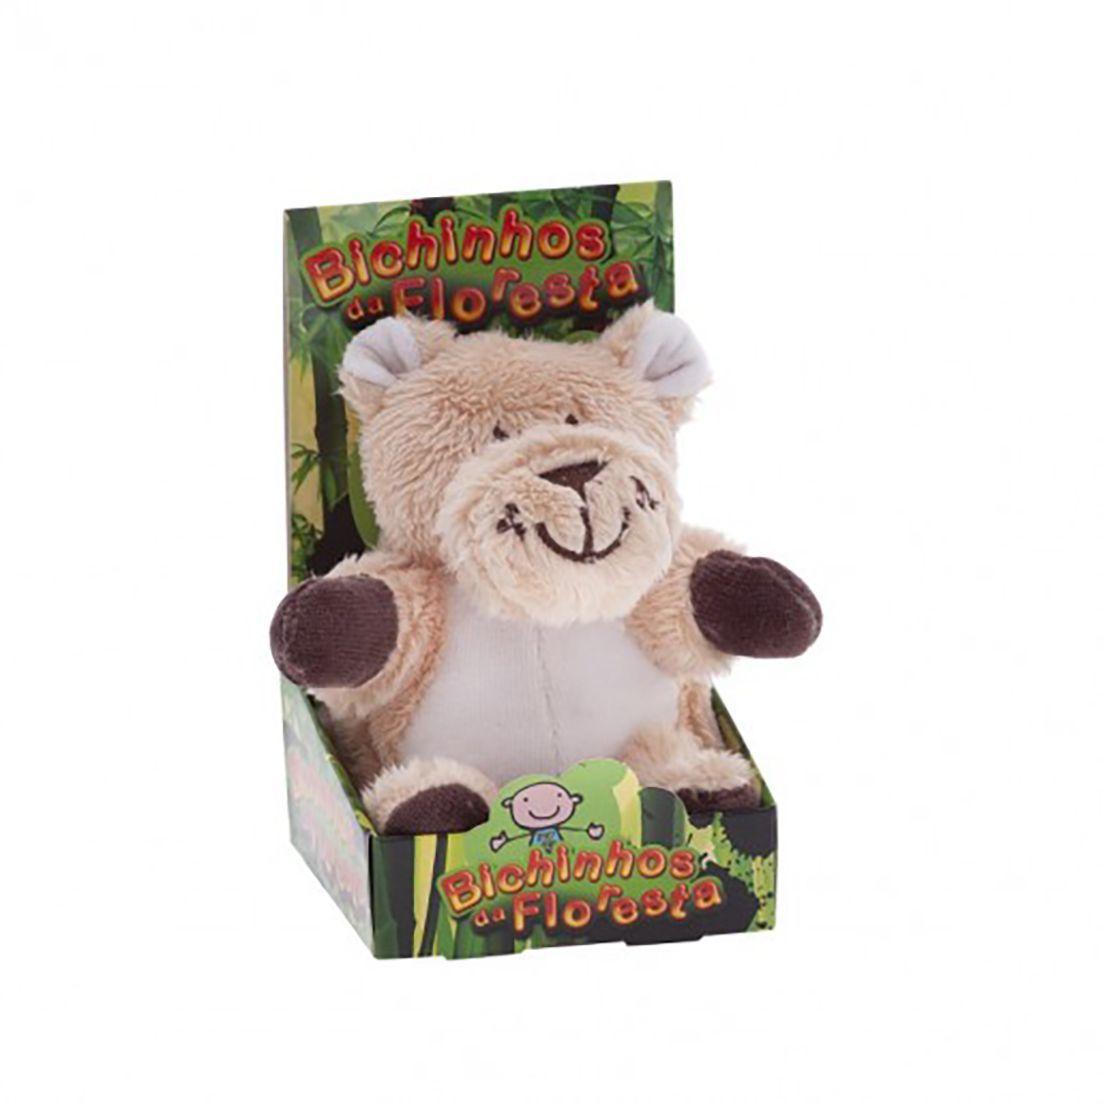 Chocalho Sensorial Mini Leoa Zip Toys  Bichos da Floresta